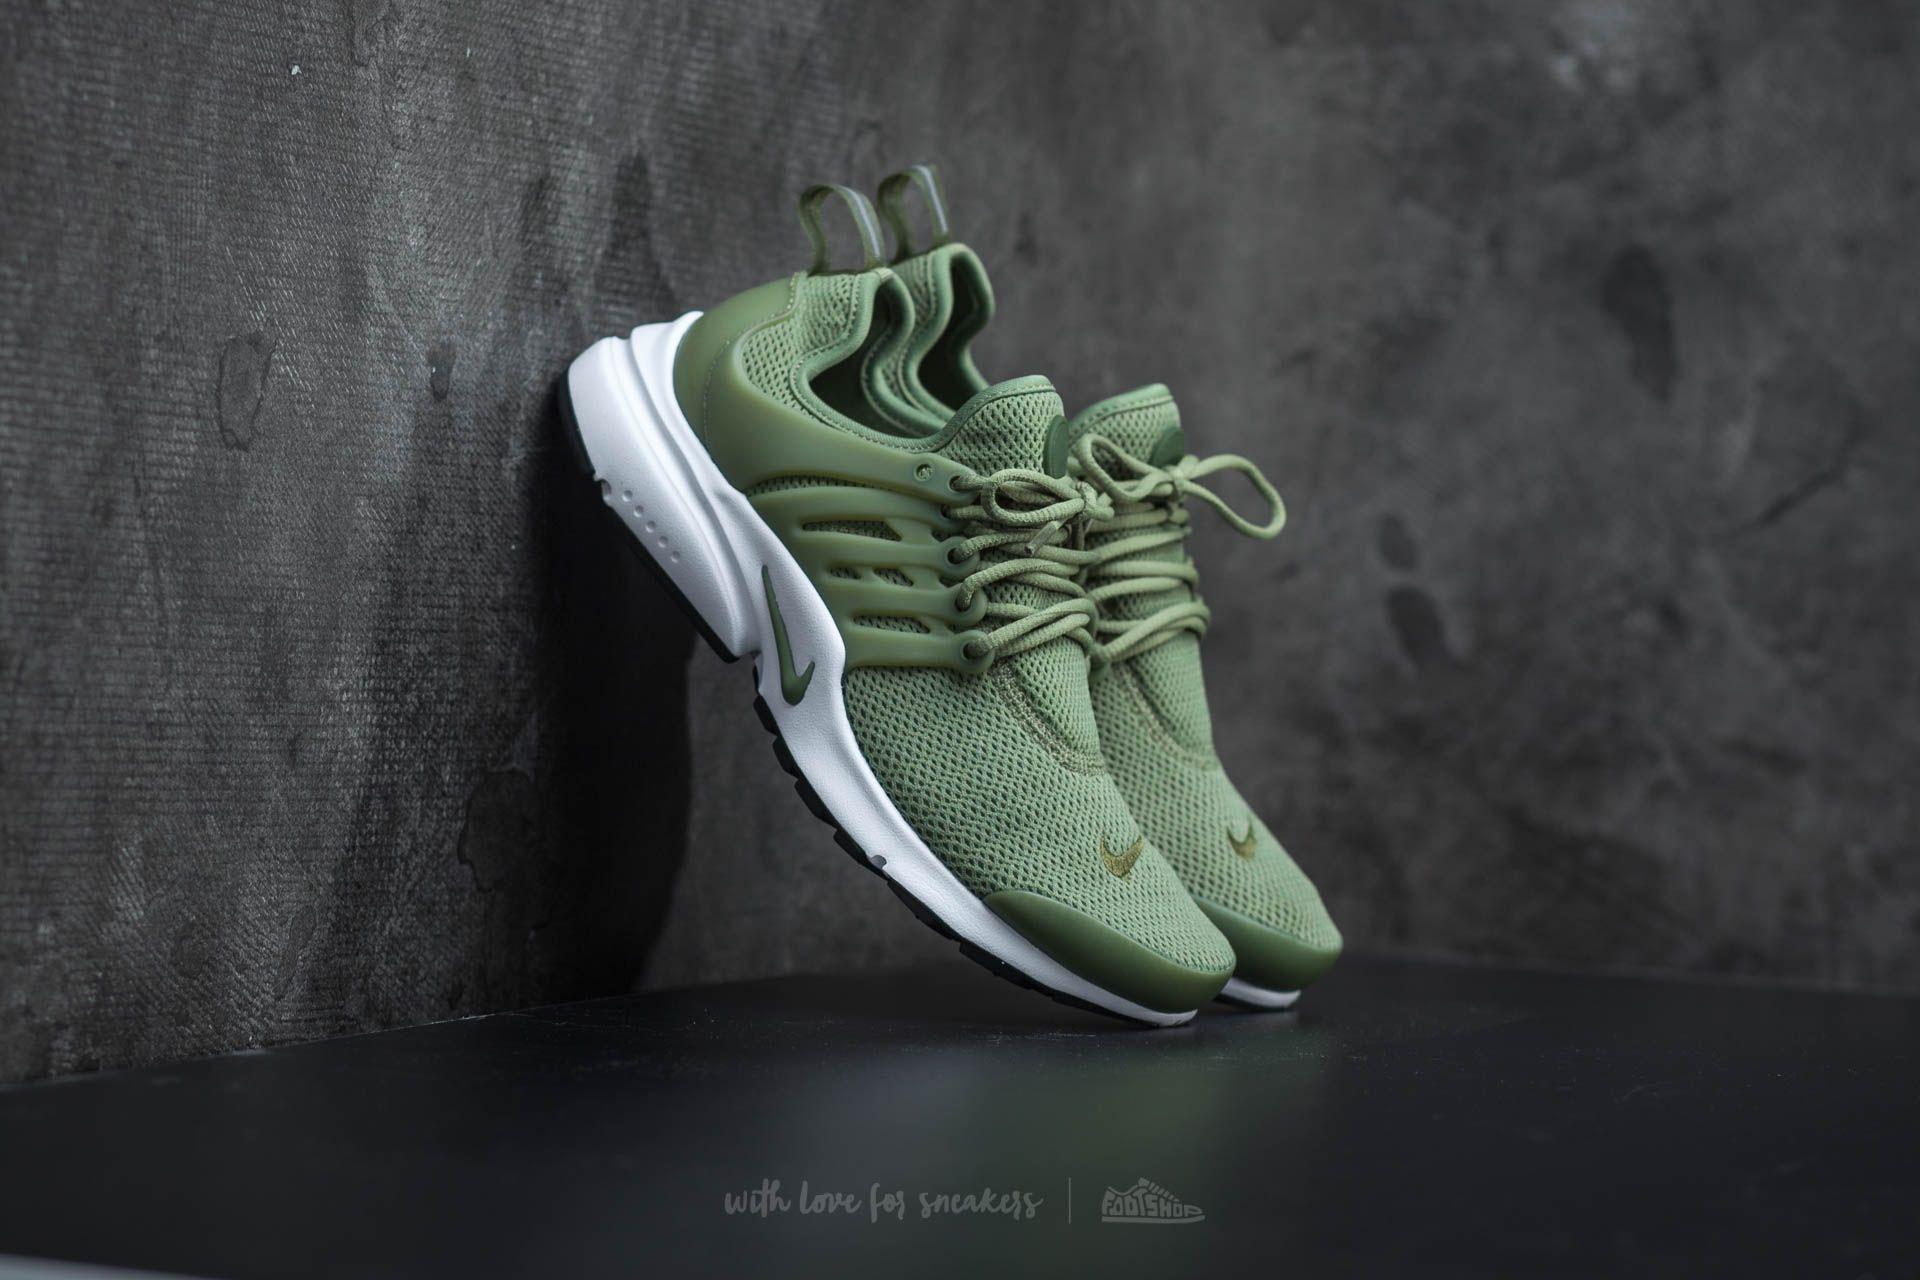 shoes,nike shoes,nike air,nike,presto,olive green,sneakers